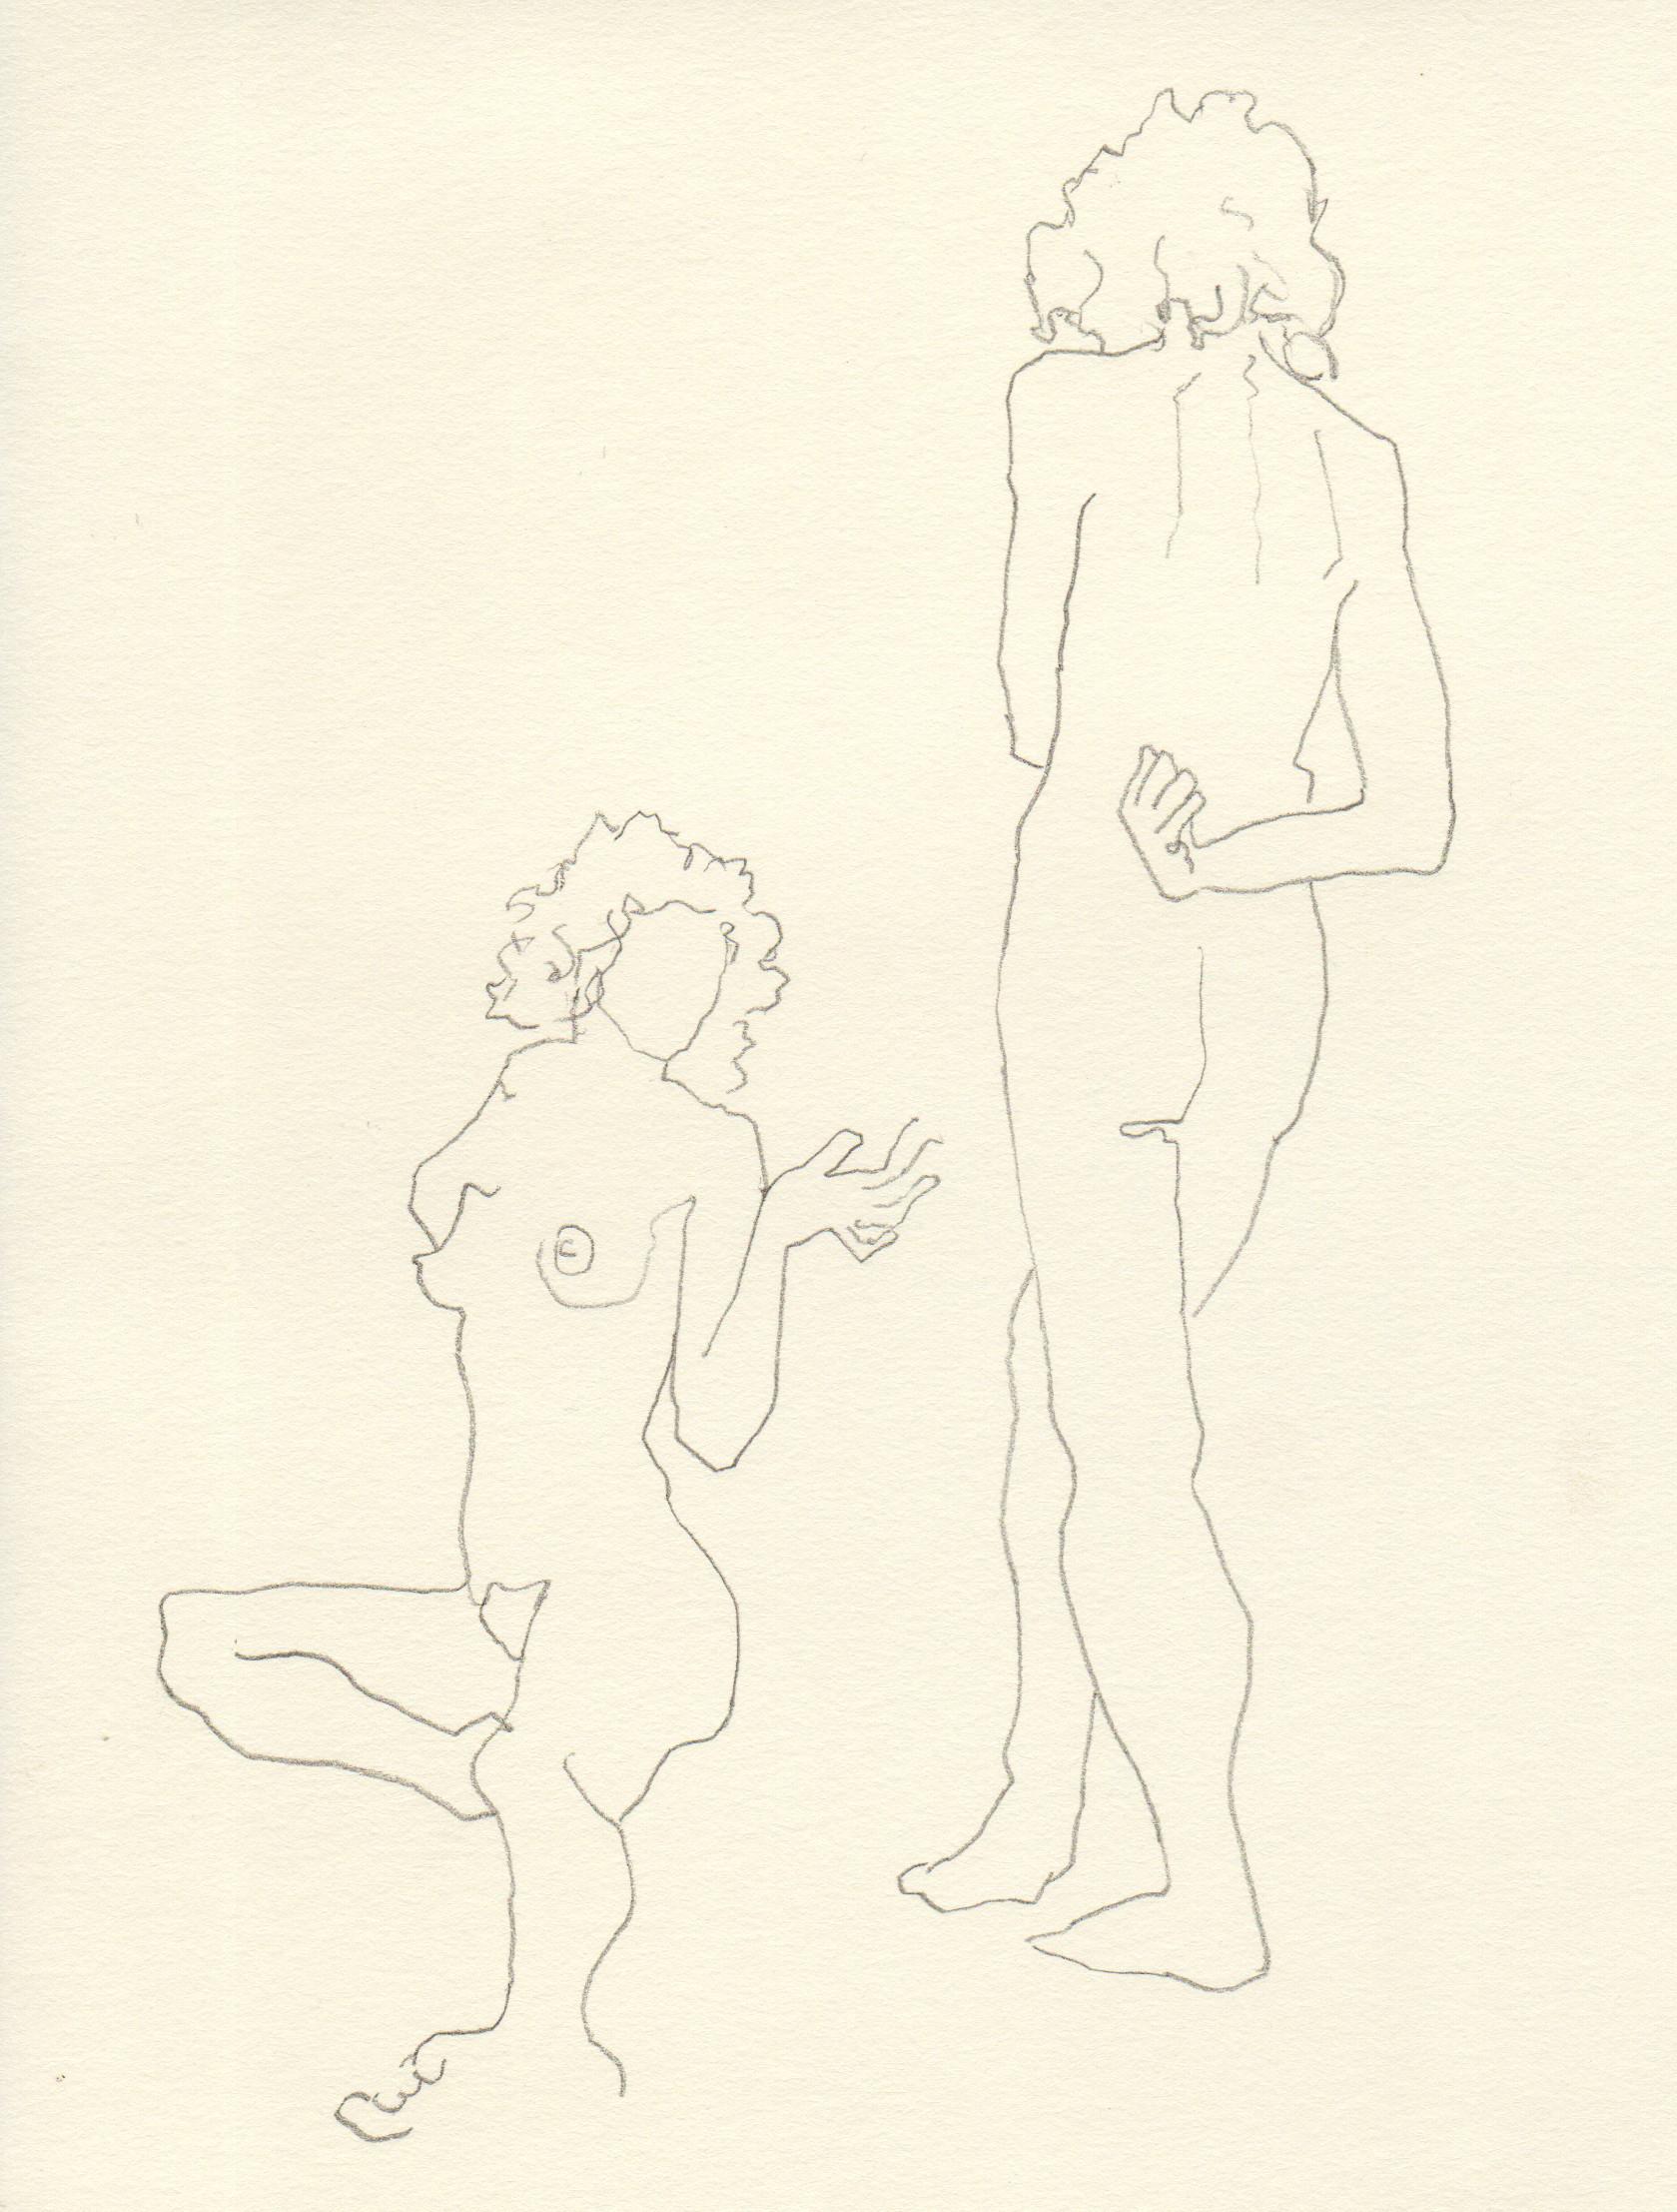 2014_Sketch_F-Beudin_02